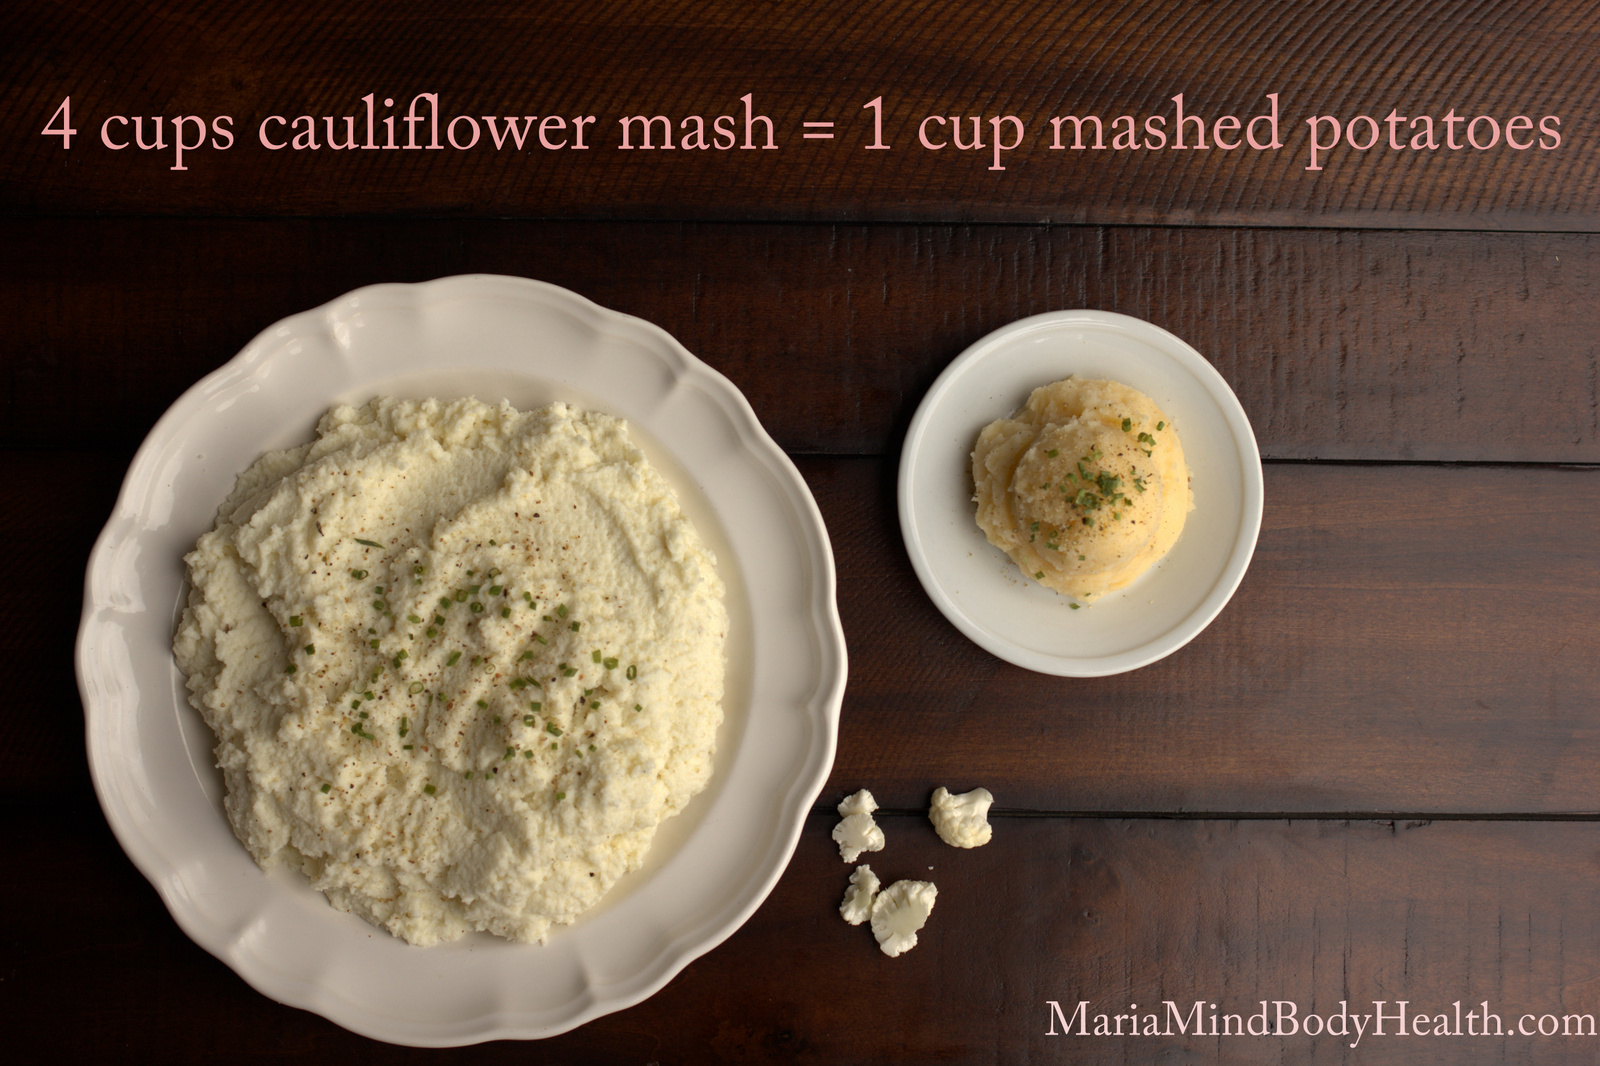 Crunchy Top Cauliflower Potatoes